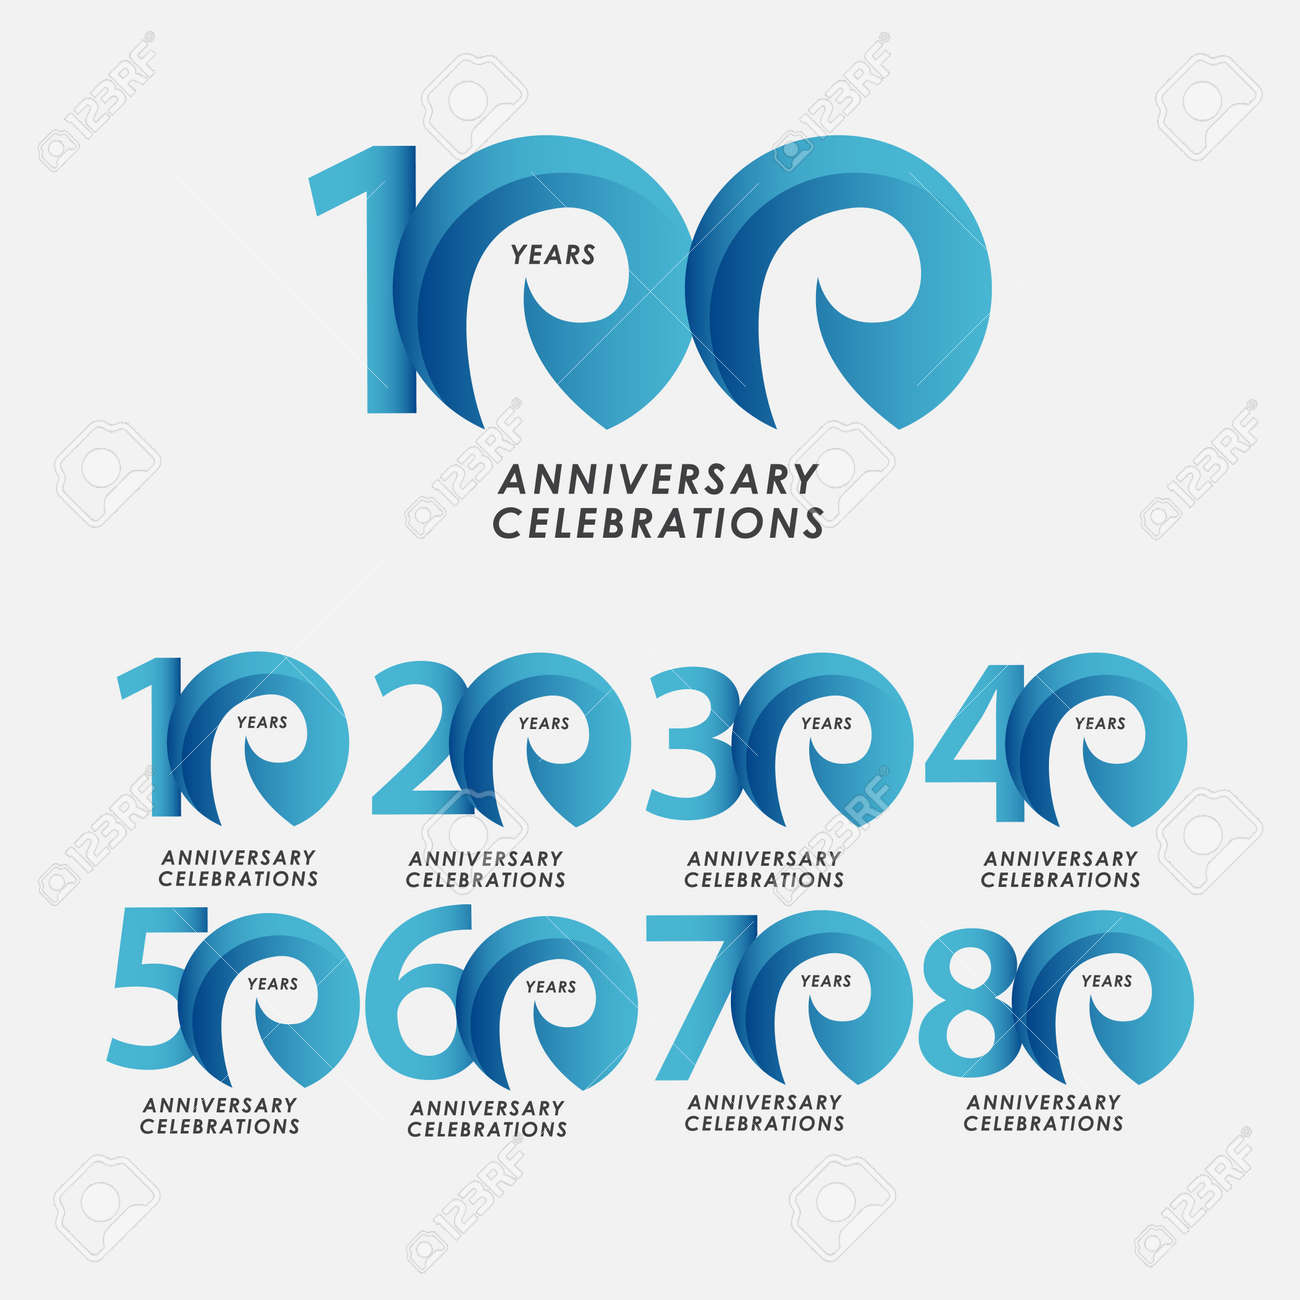 100 Years Anniversary Celebrations Vector Template Design Illustration - 163697986